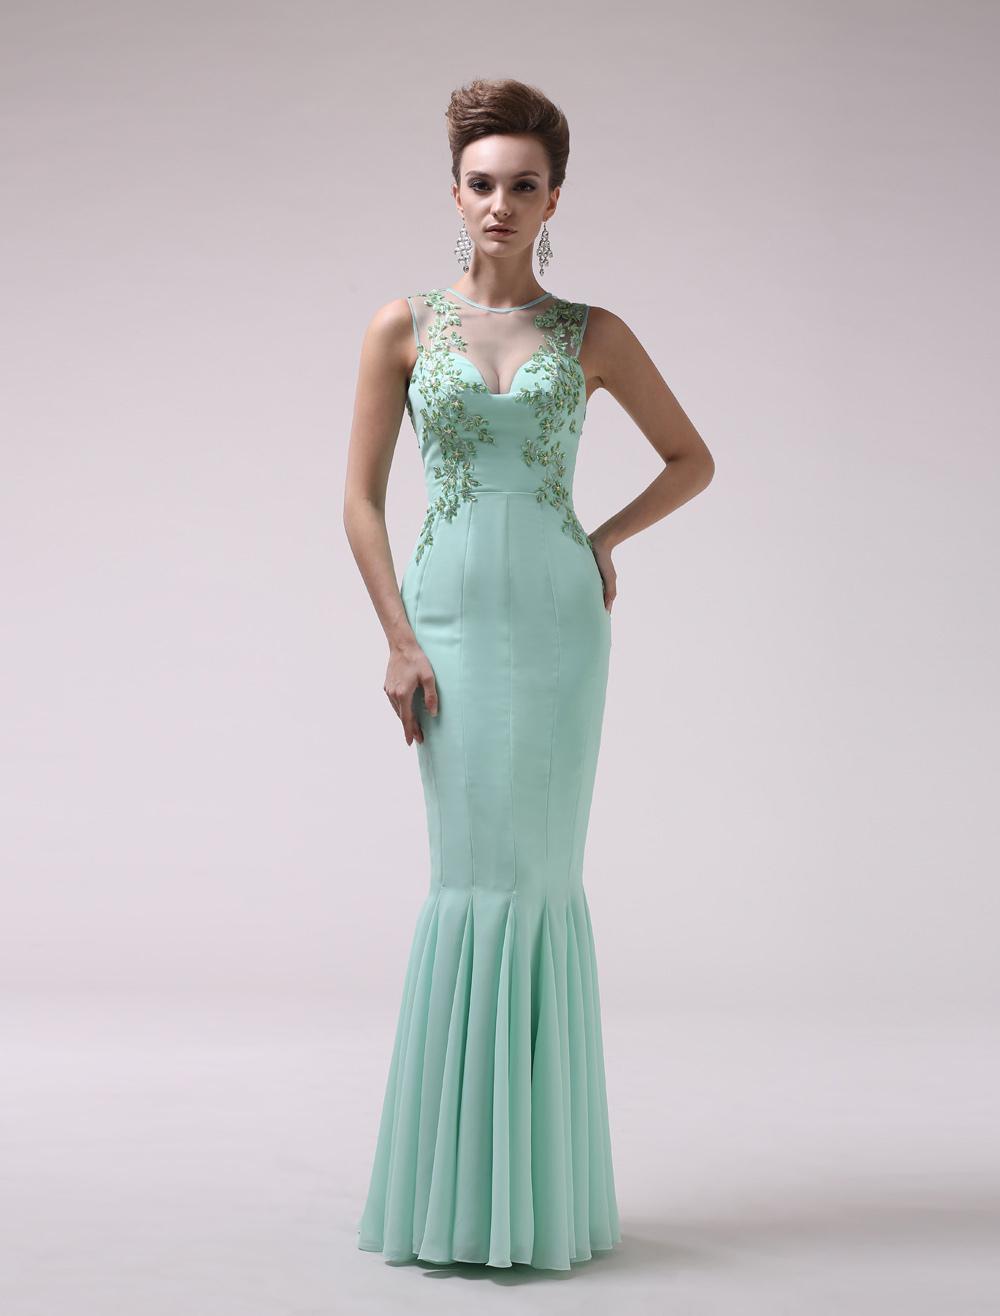 Mint Green Jewel Neck Beading Mermaid Chiffon Women's Evening Dress  Milanoo